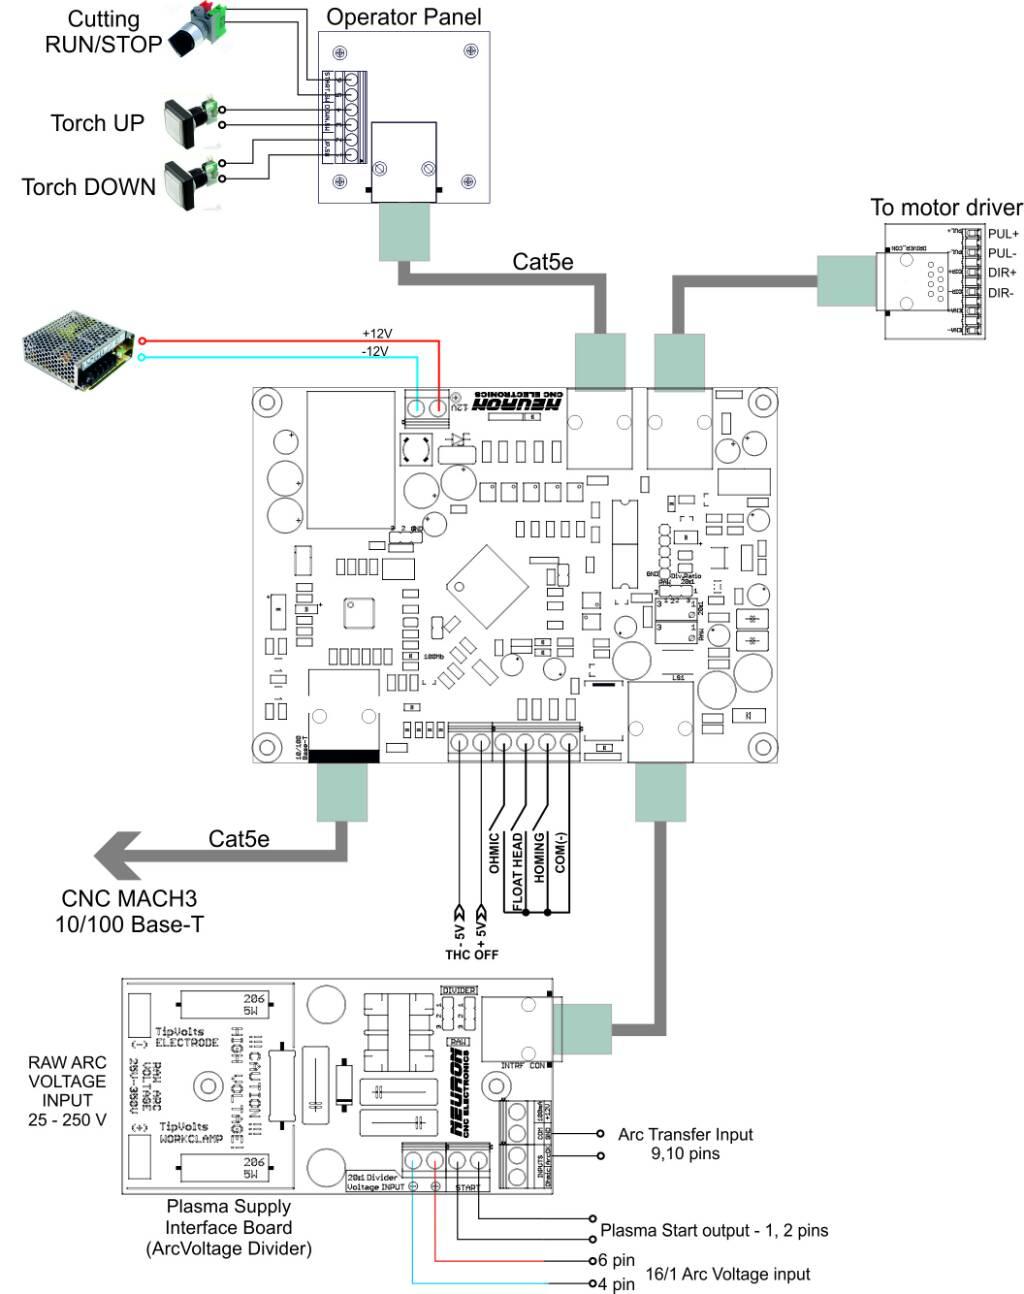 cnc machine electrical wiring diagram